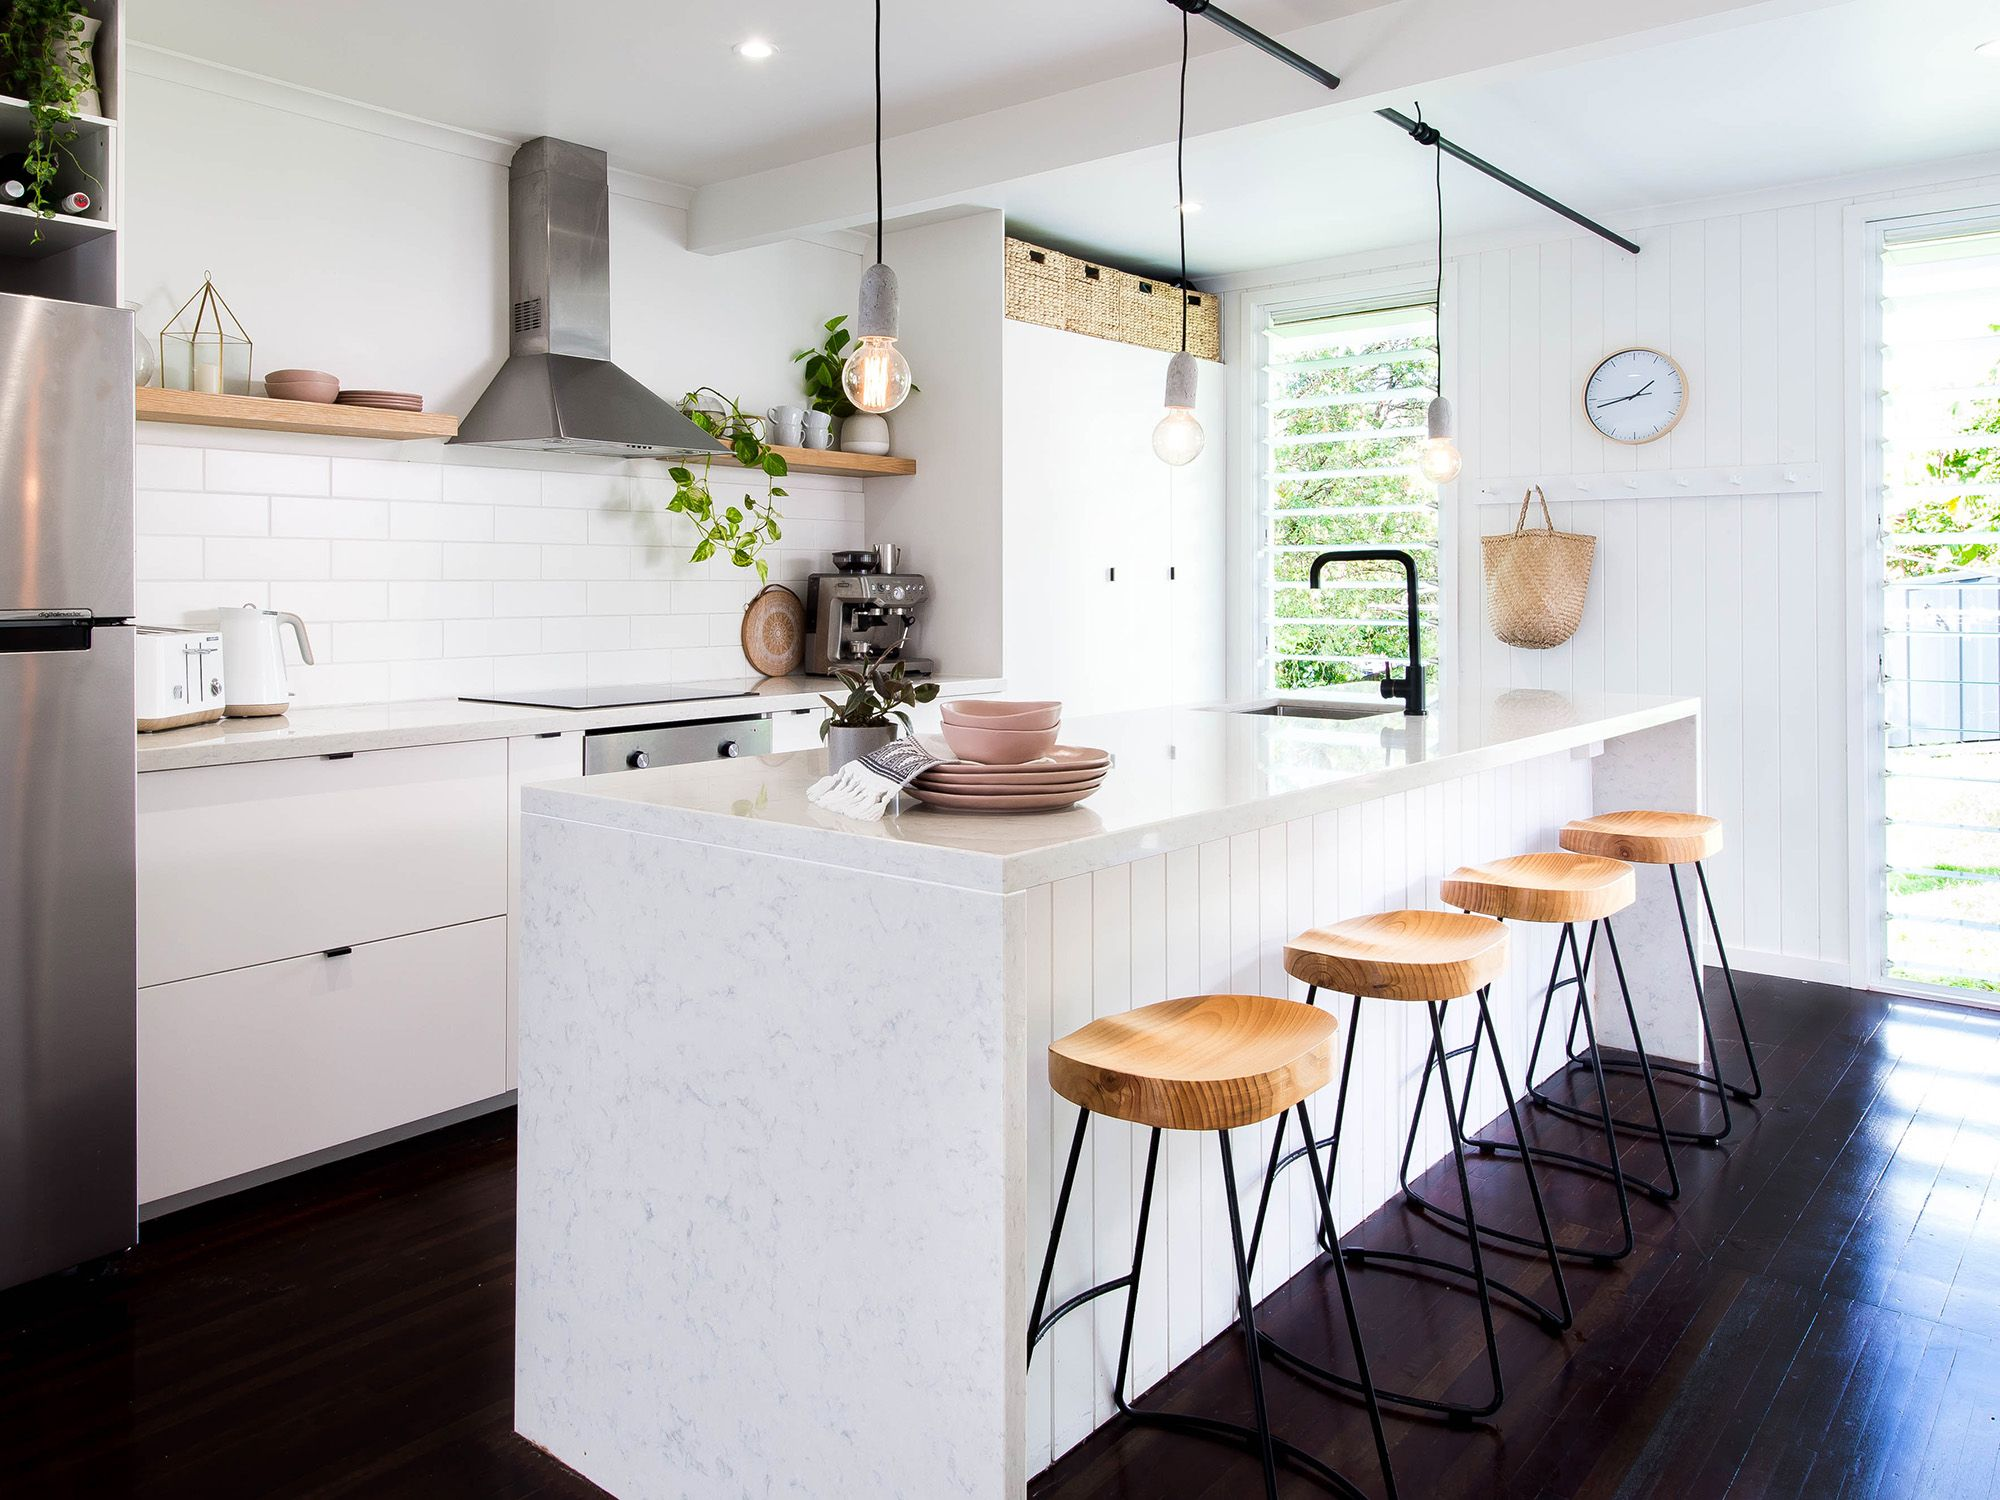 Boho Kitchen, Coastal Kitchen, VJ Panelling, Industrial